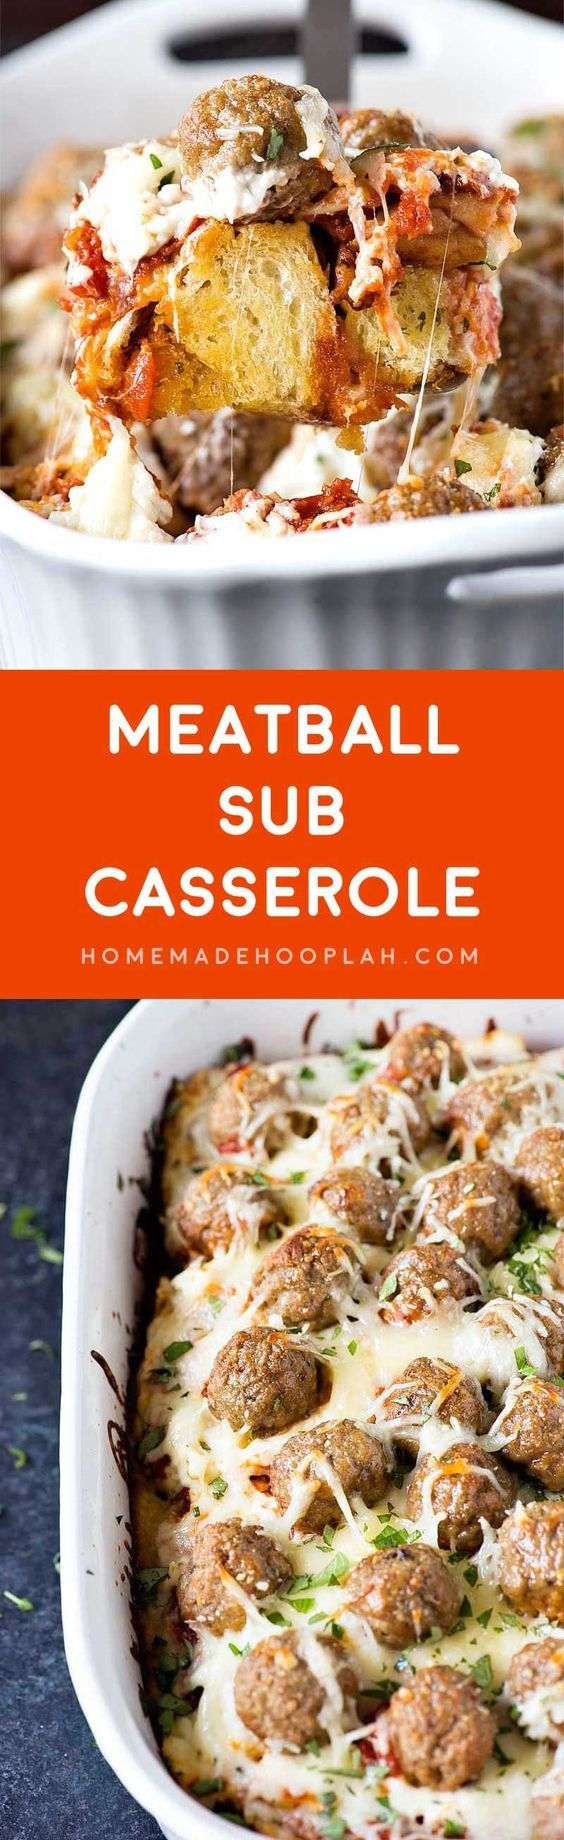 Meatball Sub Casserole! Layers of savory meatballs, creamy mozzarella cheese, and buttery garlic bread make this meatball sub casserole a perfect weeknight dinner.   HomemadeHooplah.com